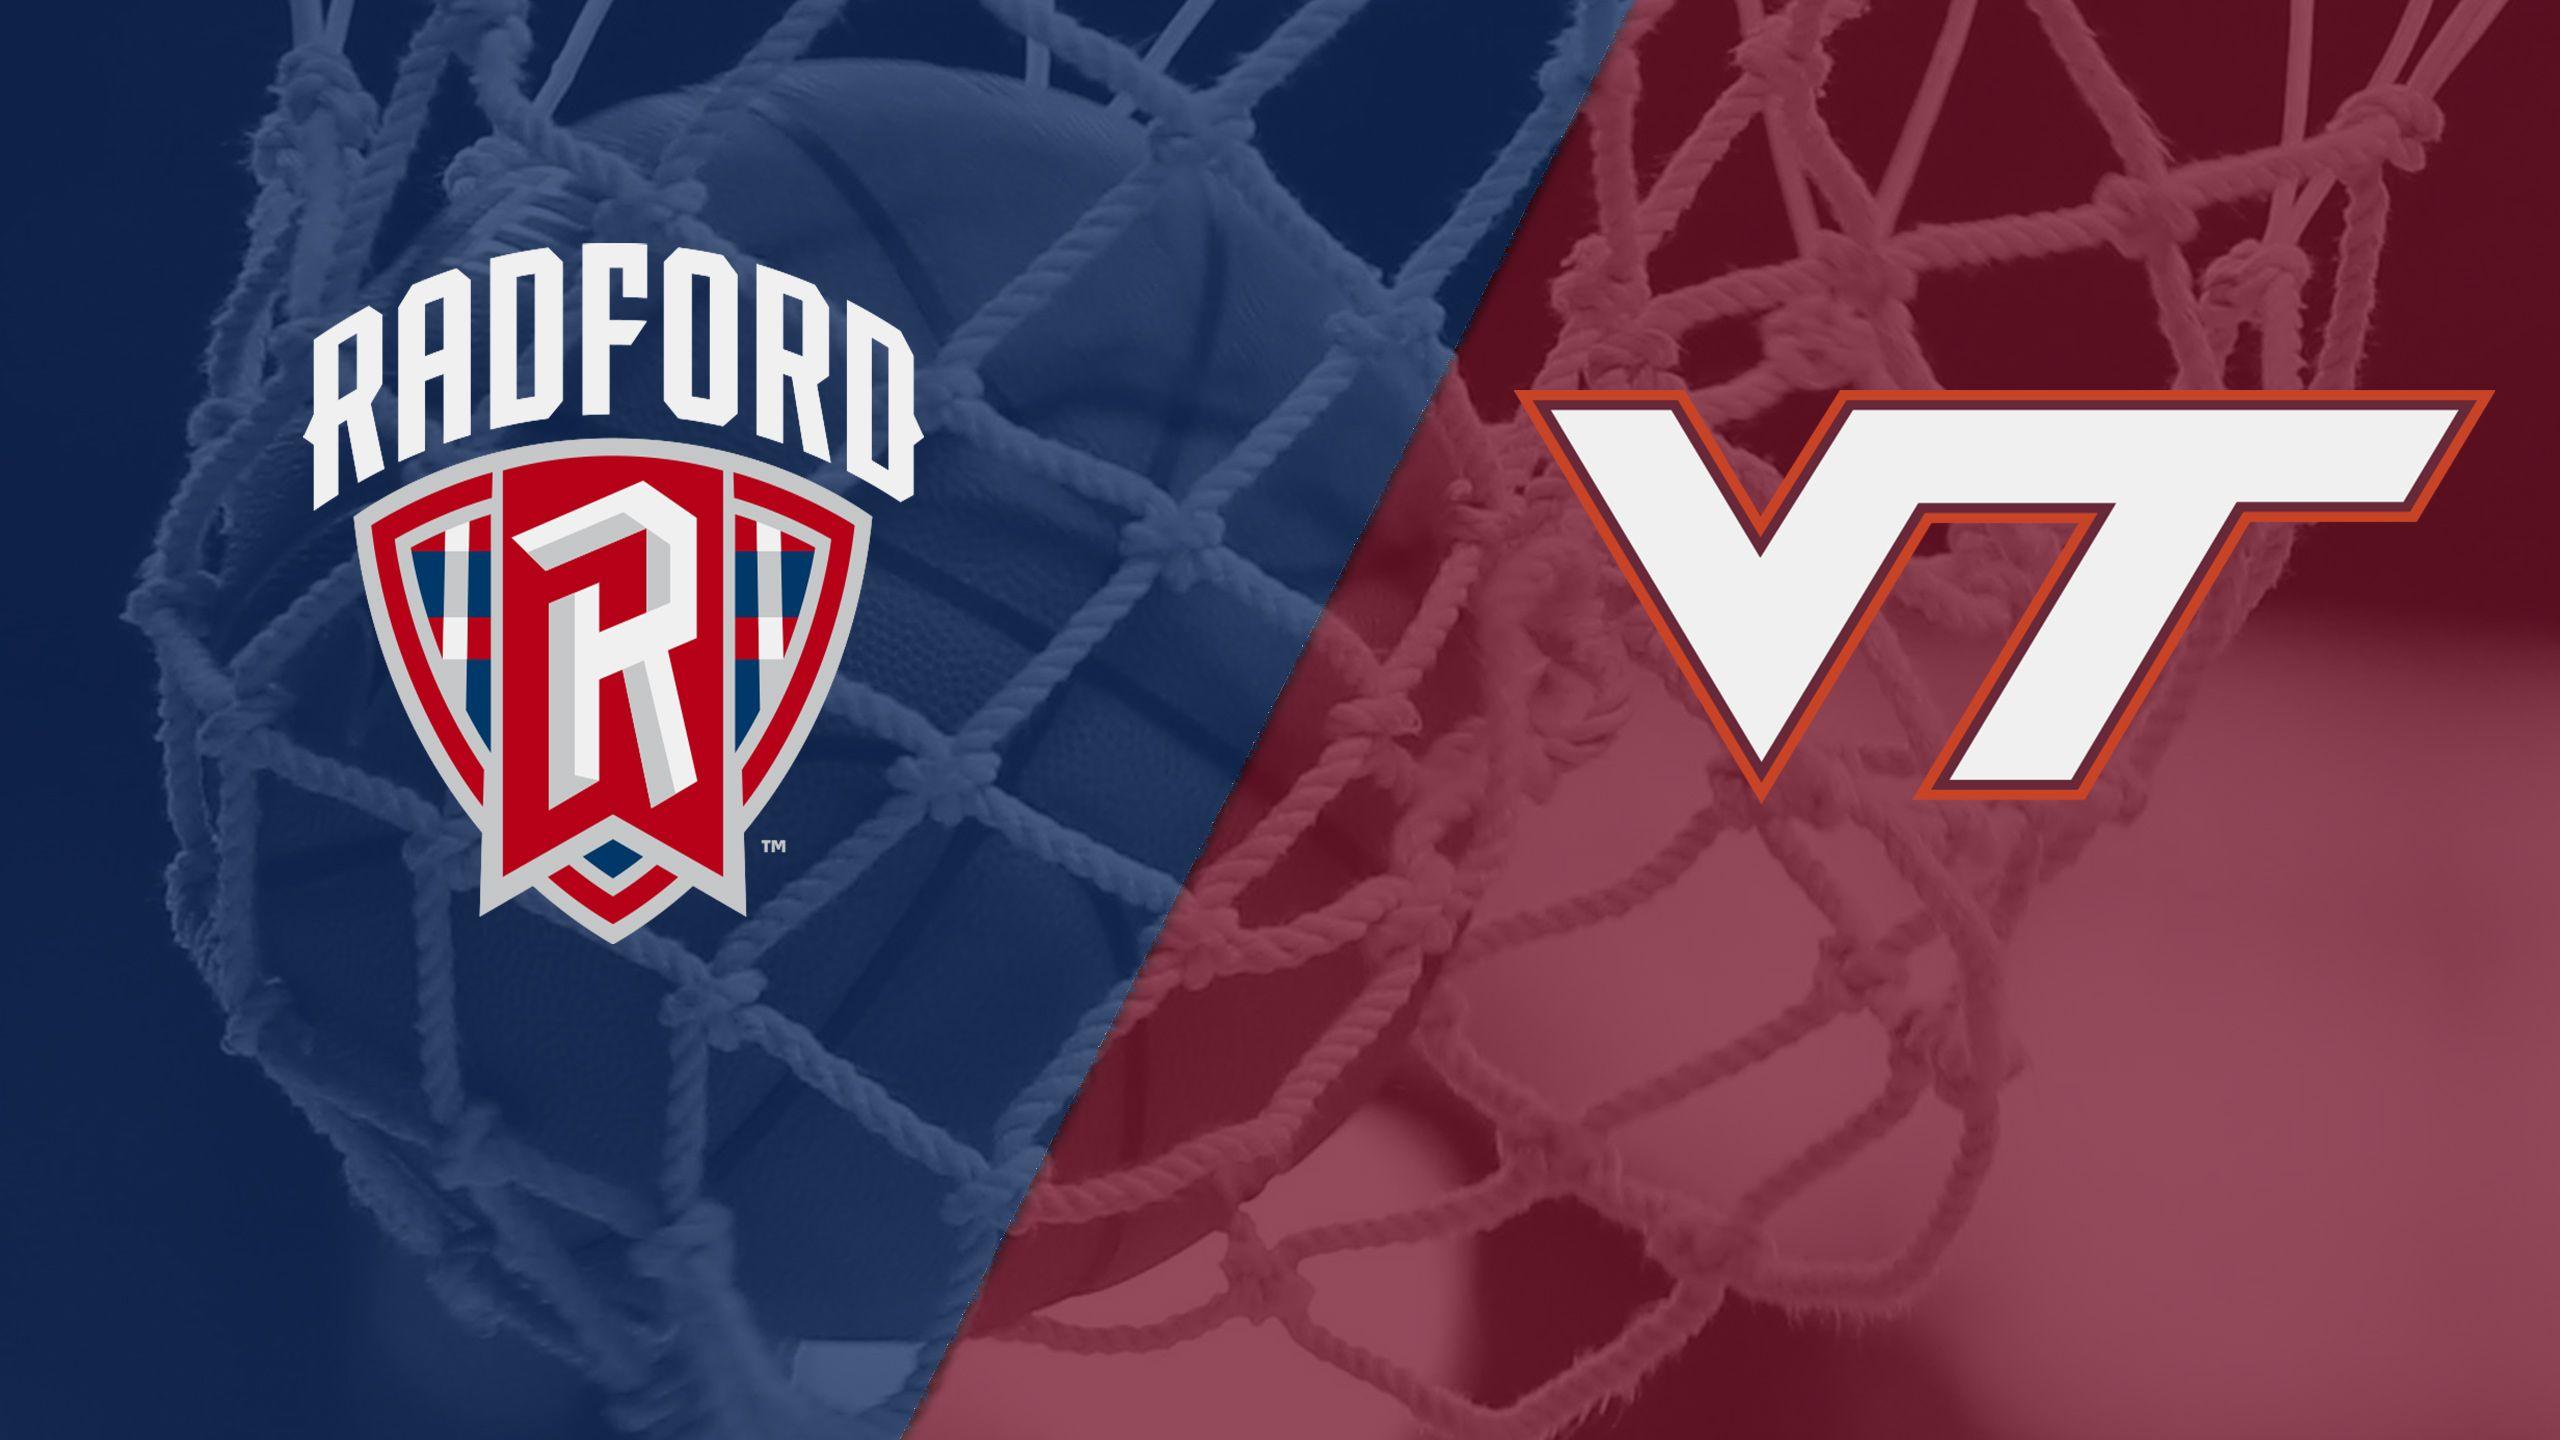 Radford vs. Virginia Tech (W Basketball)